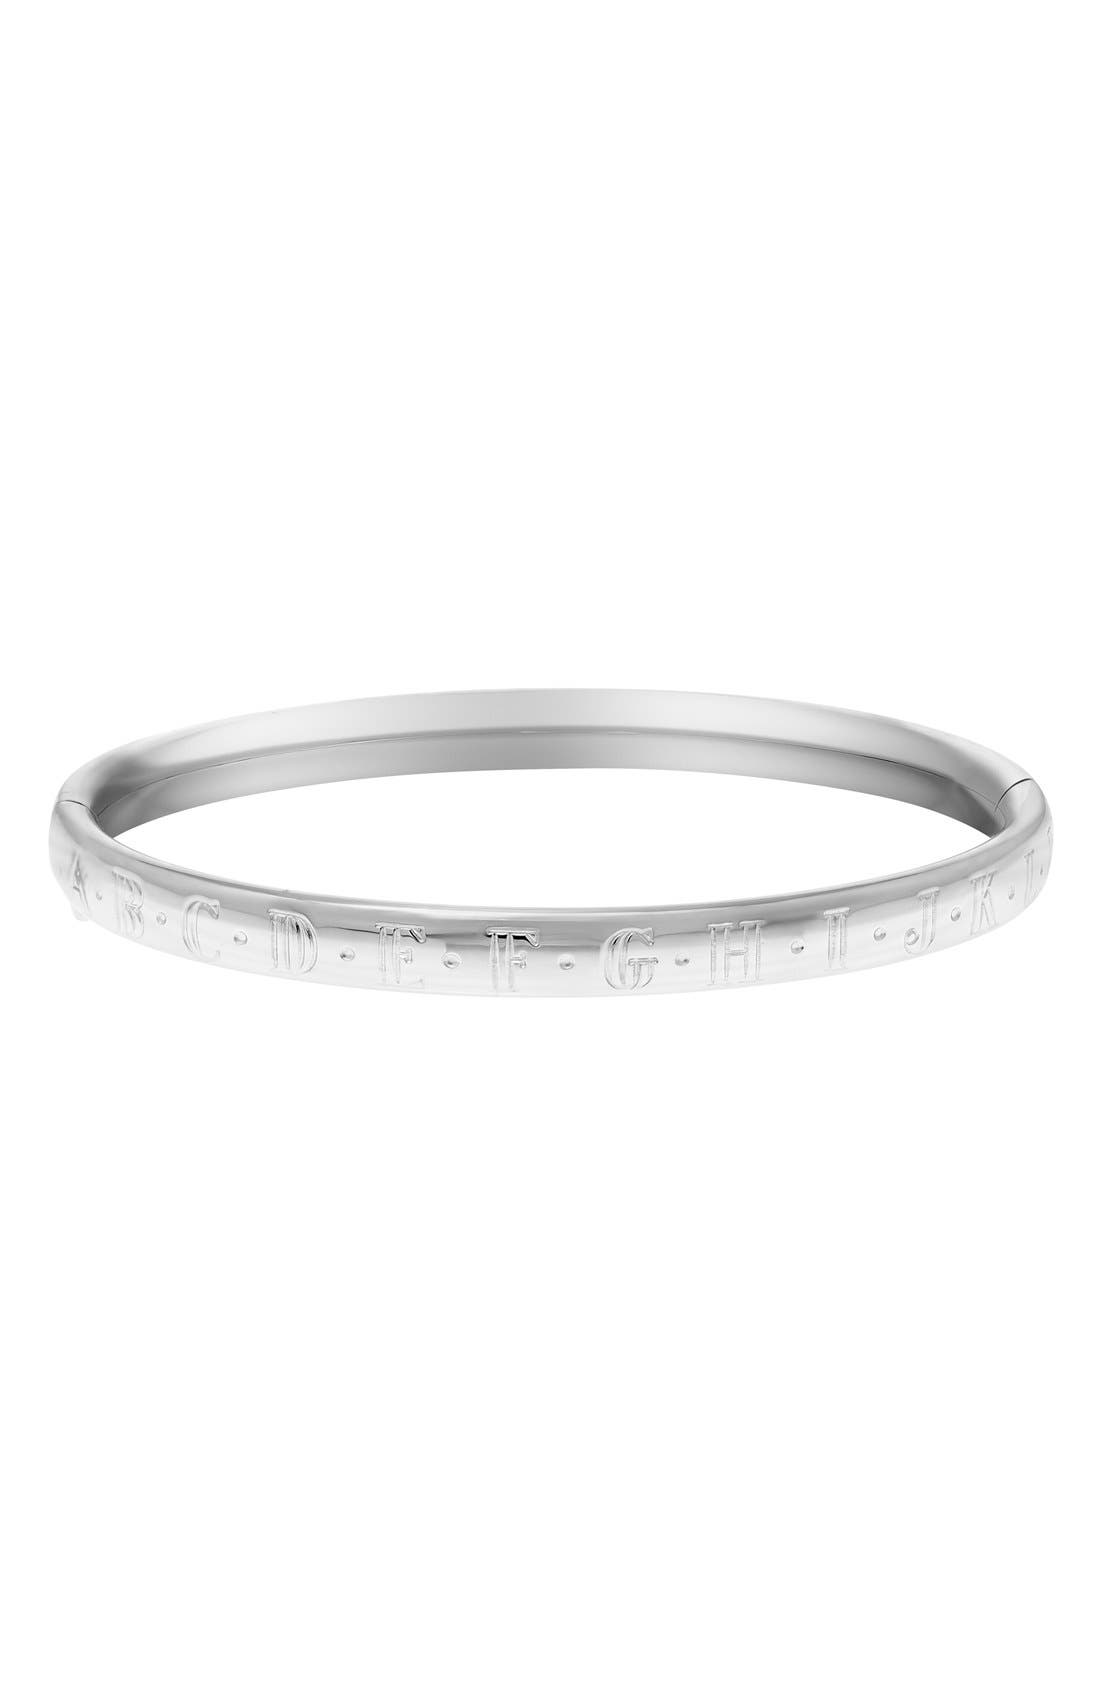 MIGNONETTE Alphabet Sterling Silver Bracelet